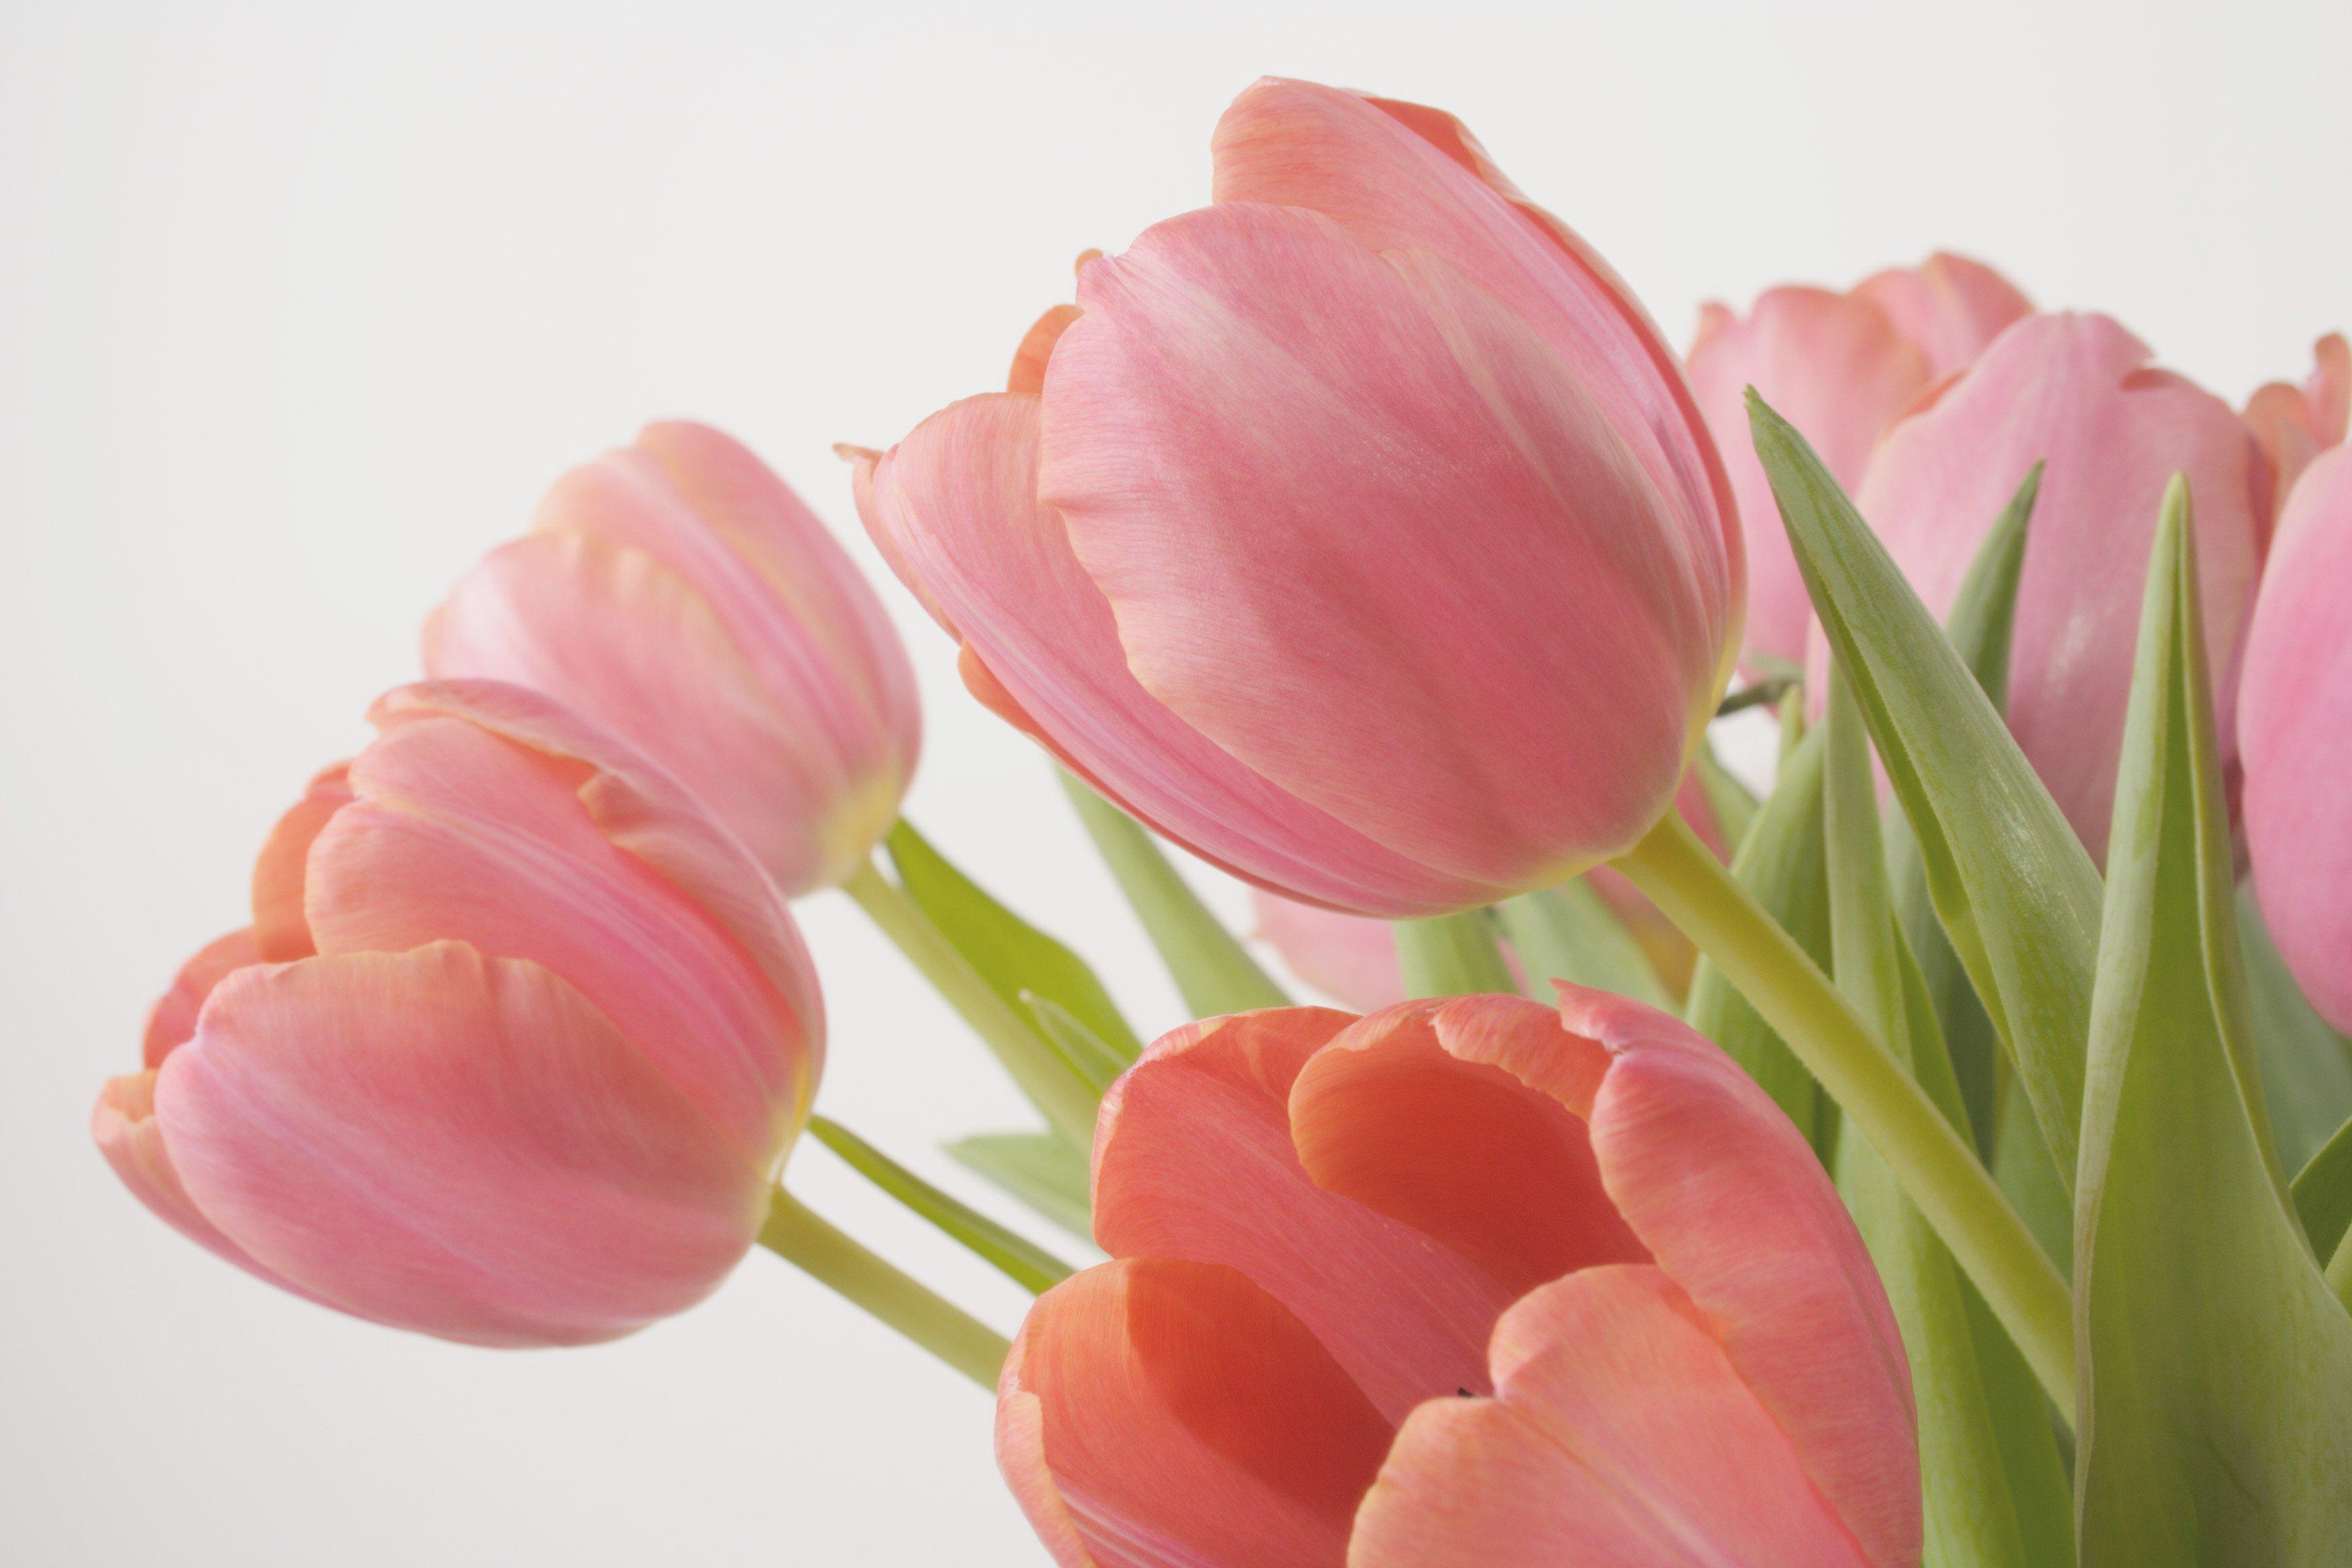 Celebrate international Mother's Day